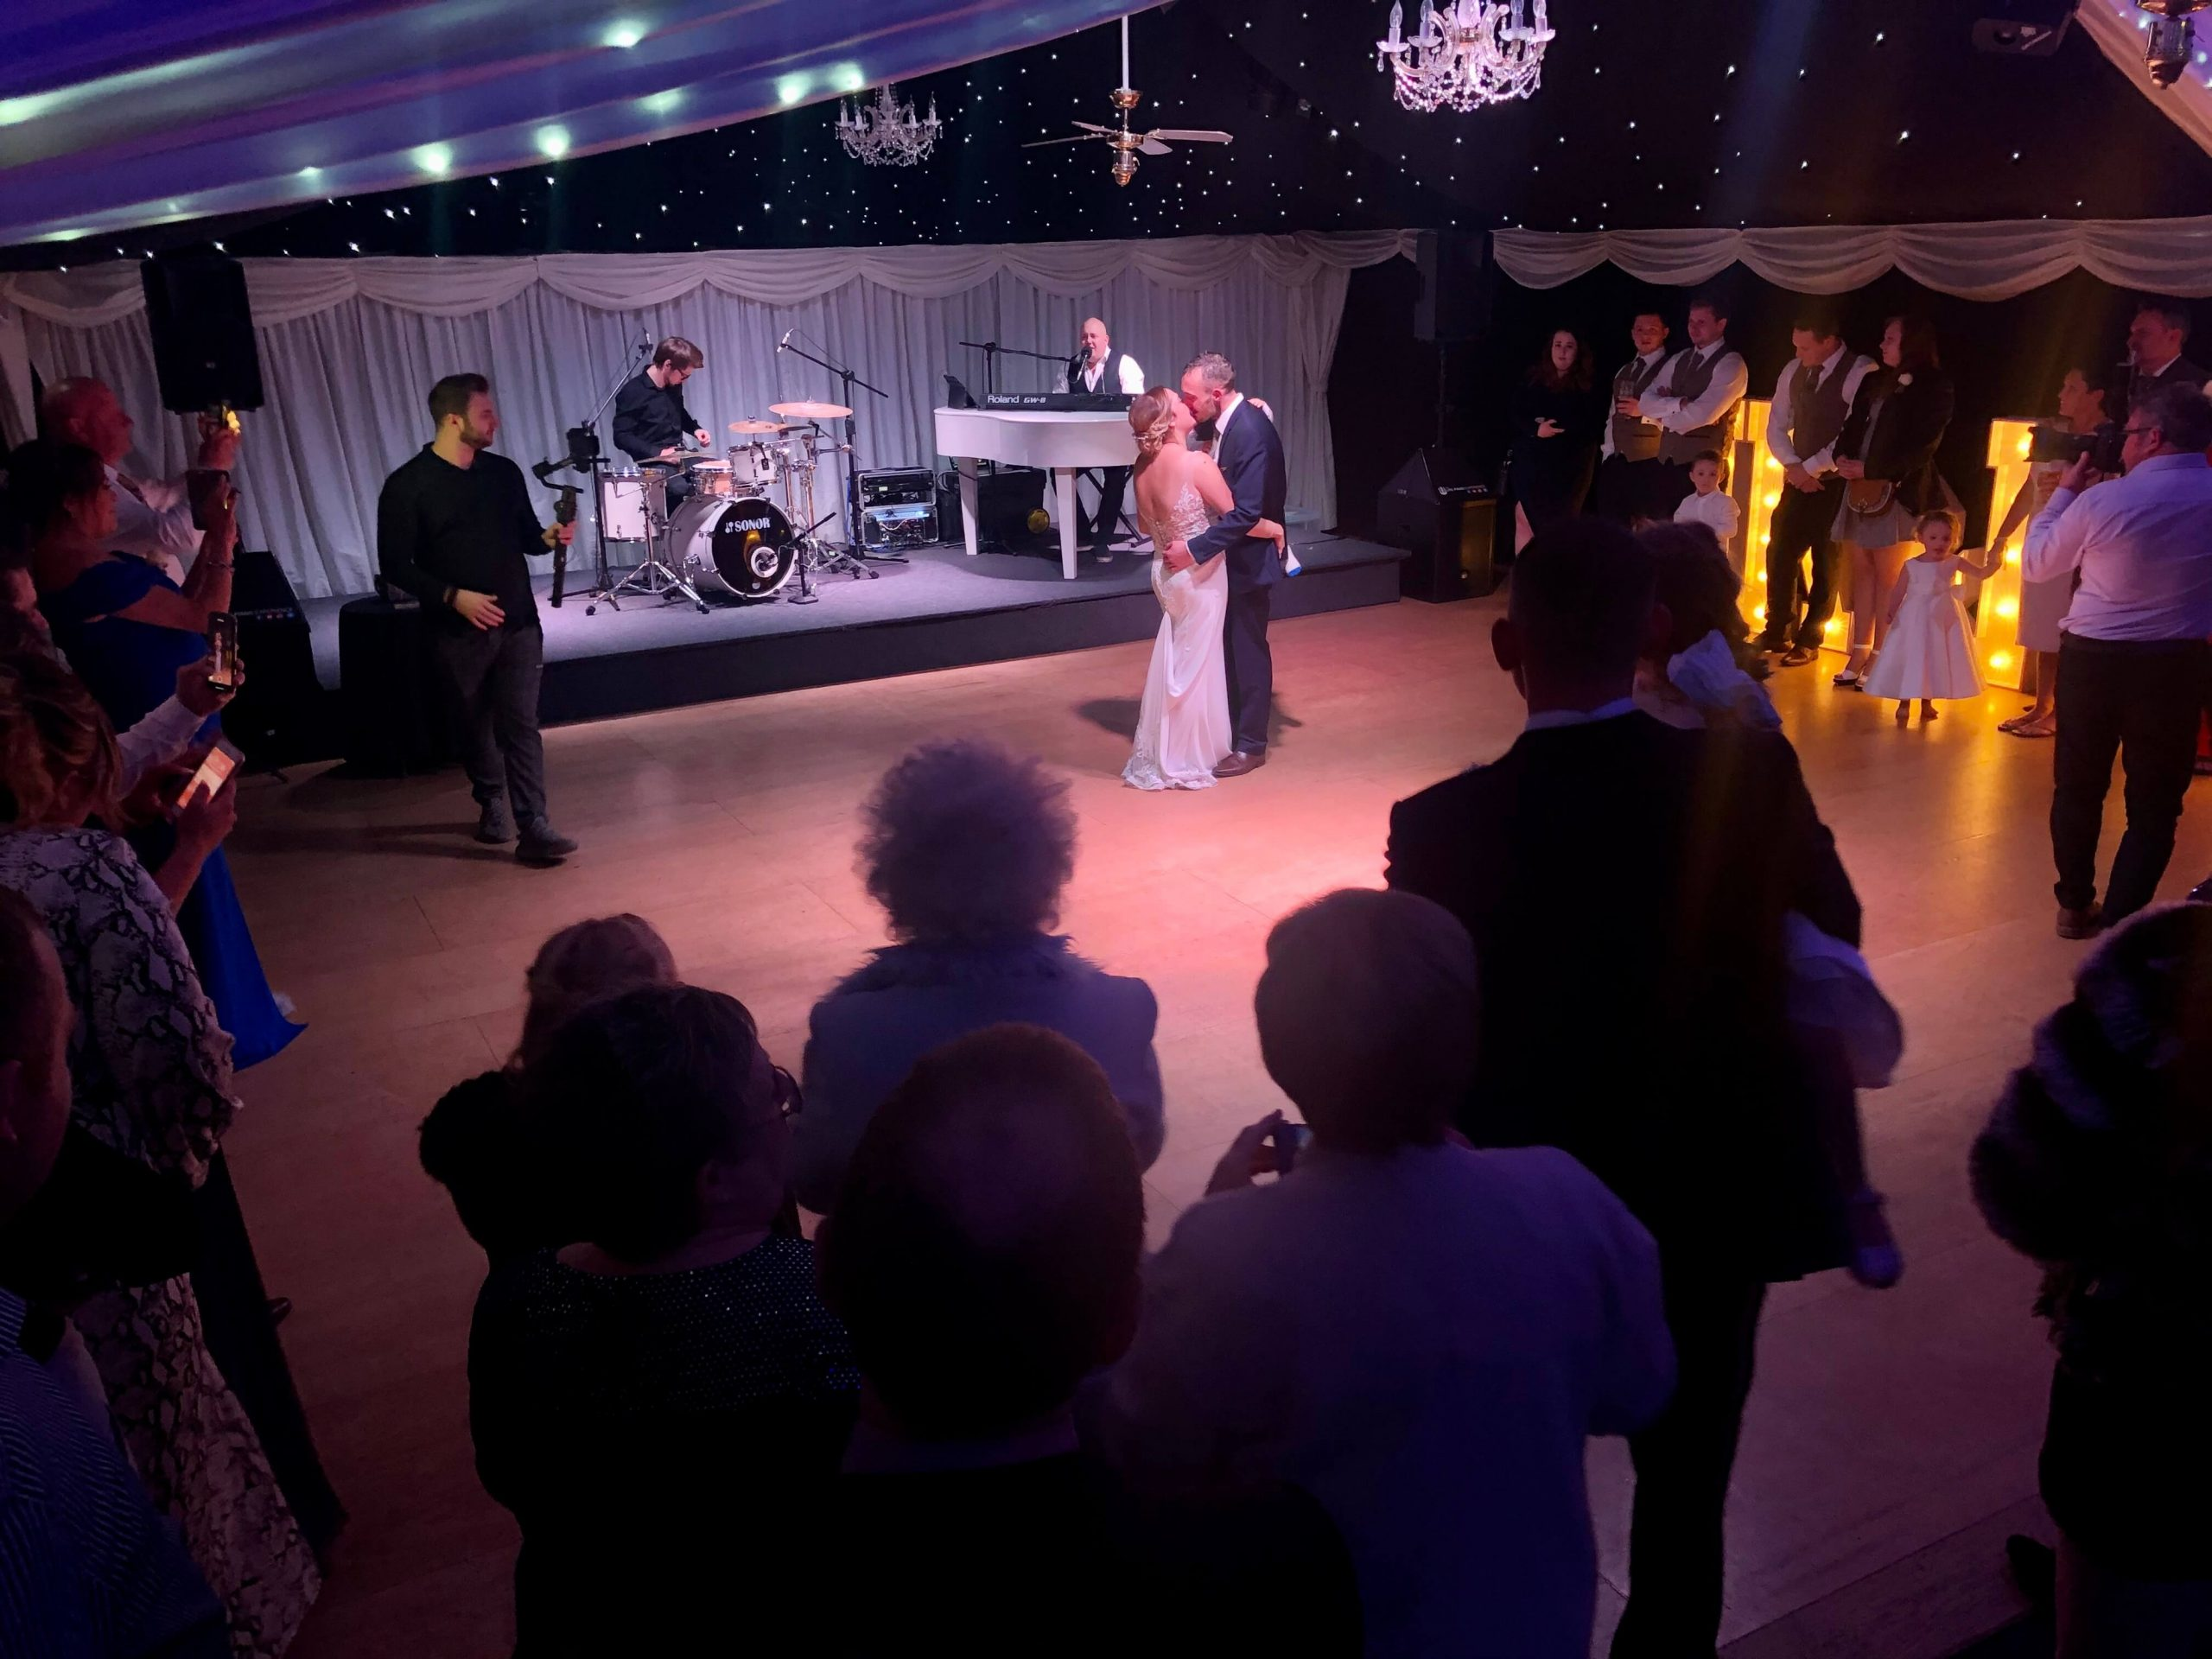 Mr and Mrs Hurlestone Wedding - First dance with PianoJam at Heaton House Farm